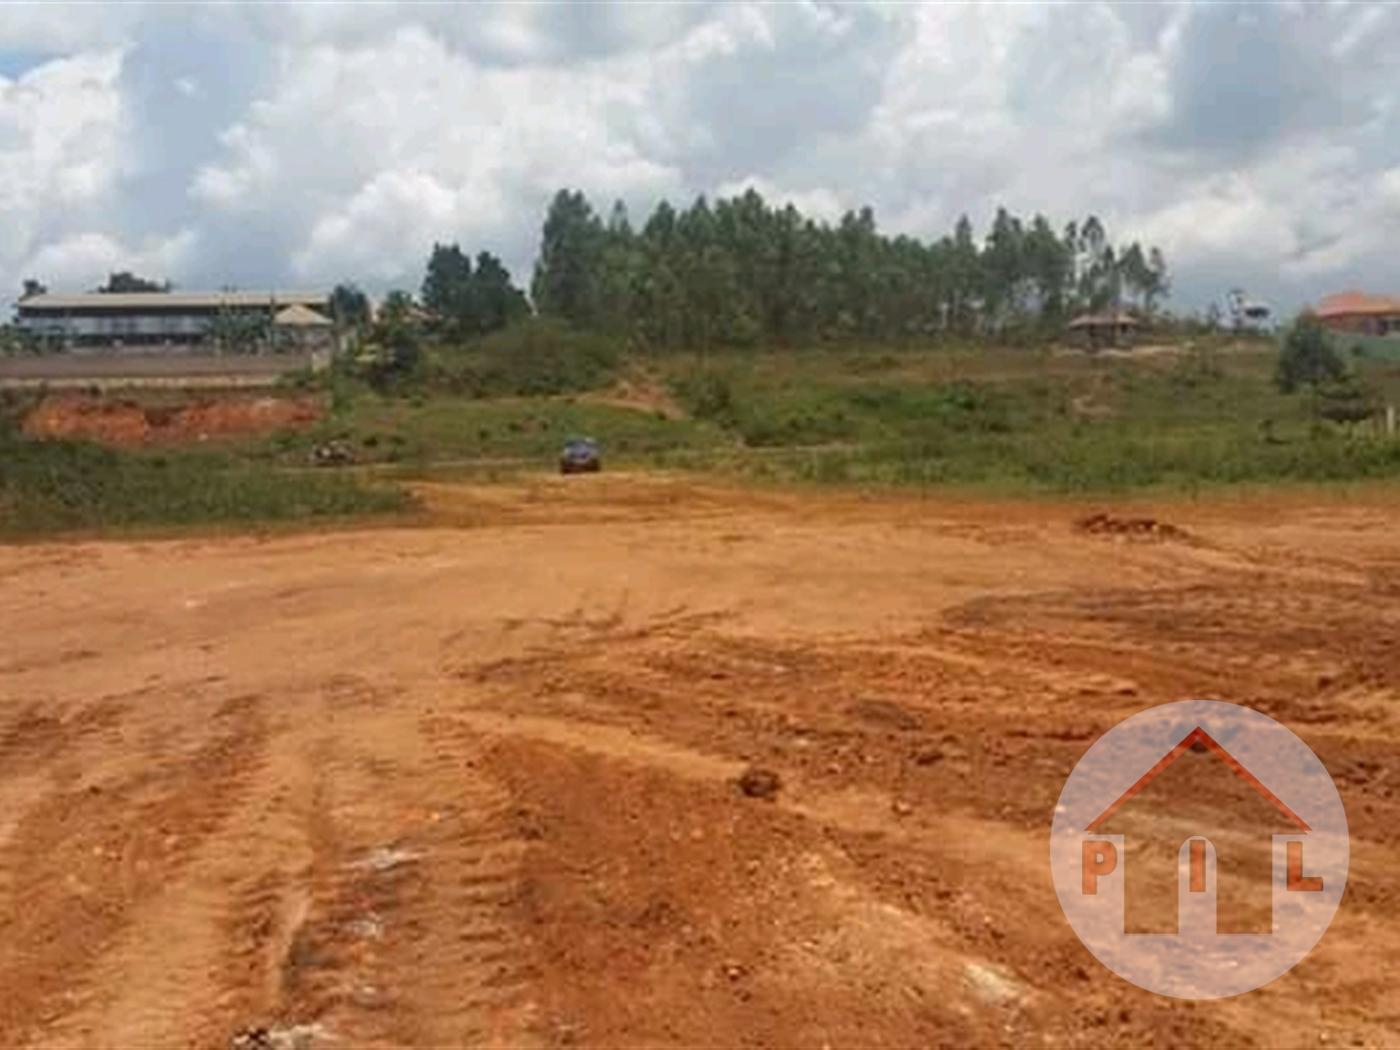 Residential Land for sale in Rweiziringiro Mbarara